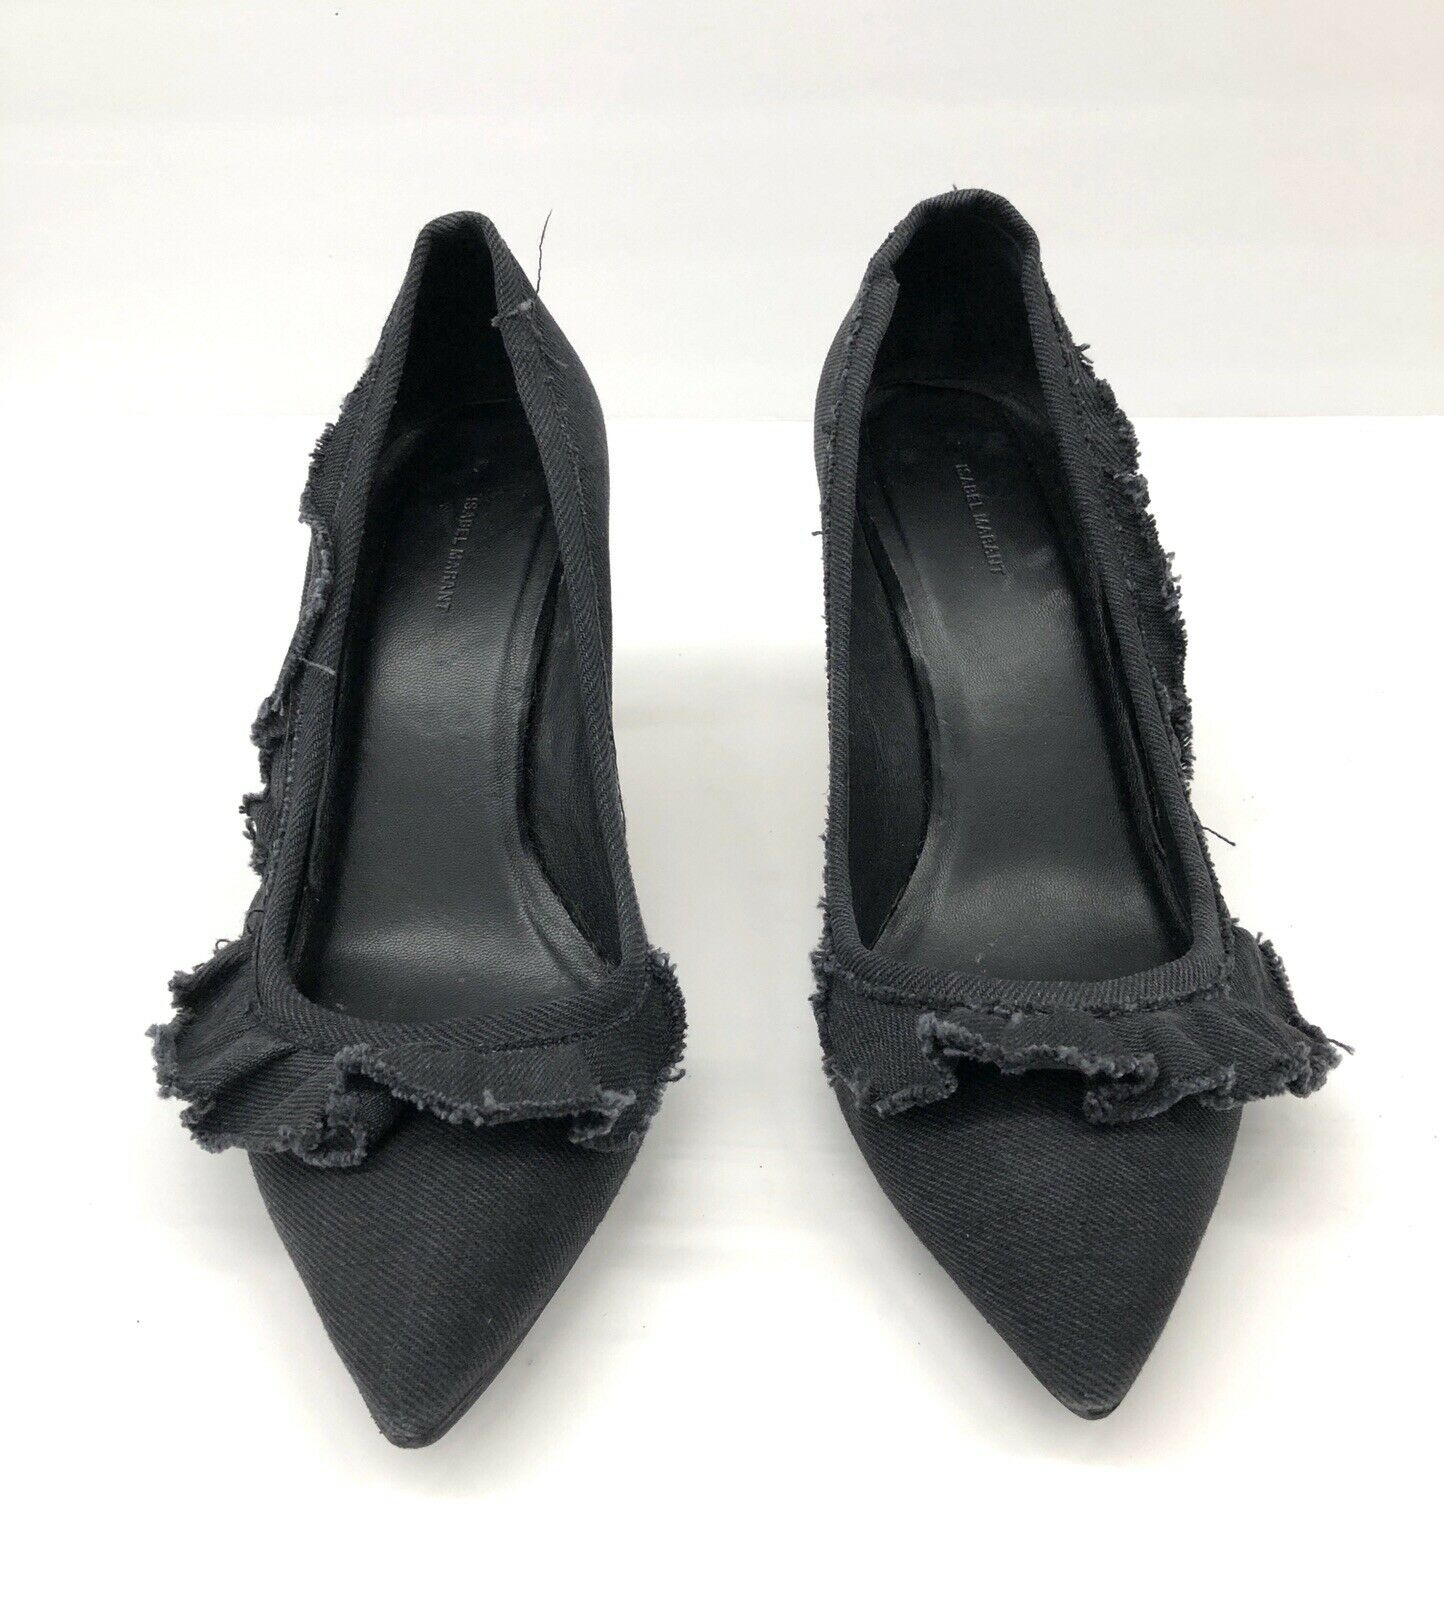 350 ISABEL MARANT Pointy Heels Pumps Dark grau Fabric Größe 39 eu   8 us